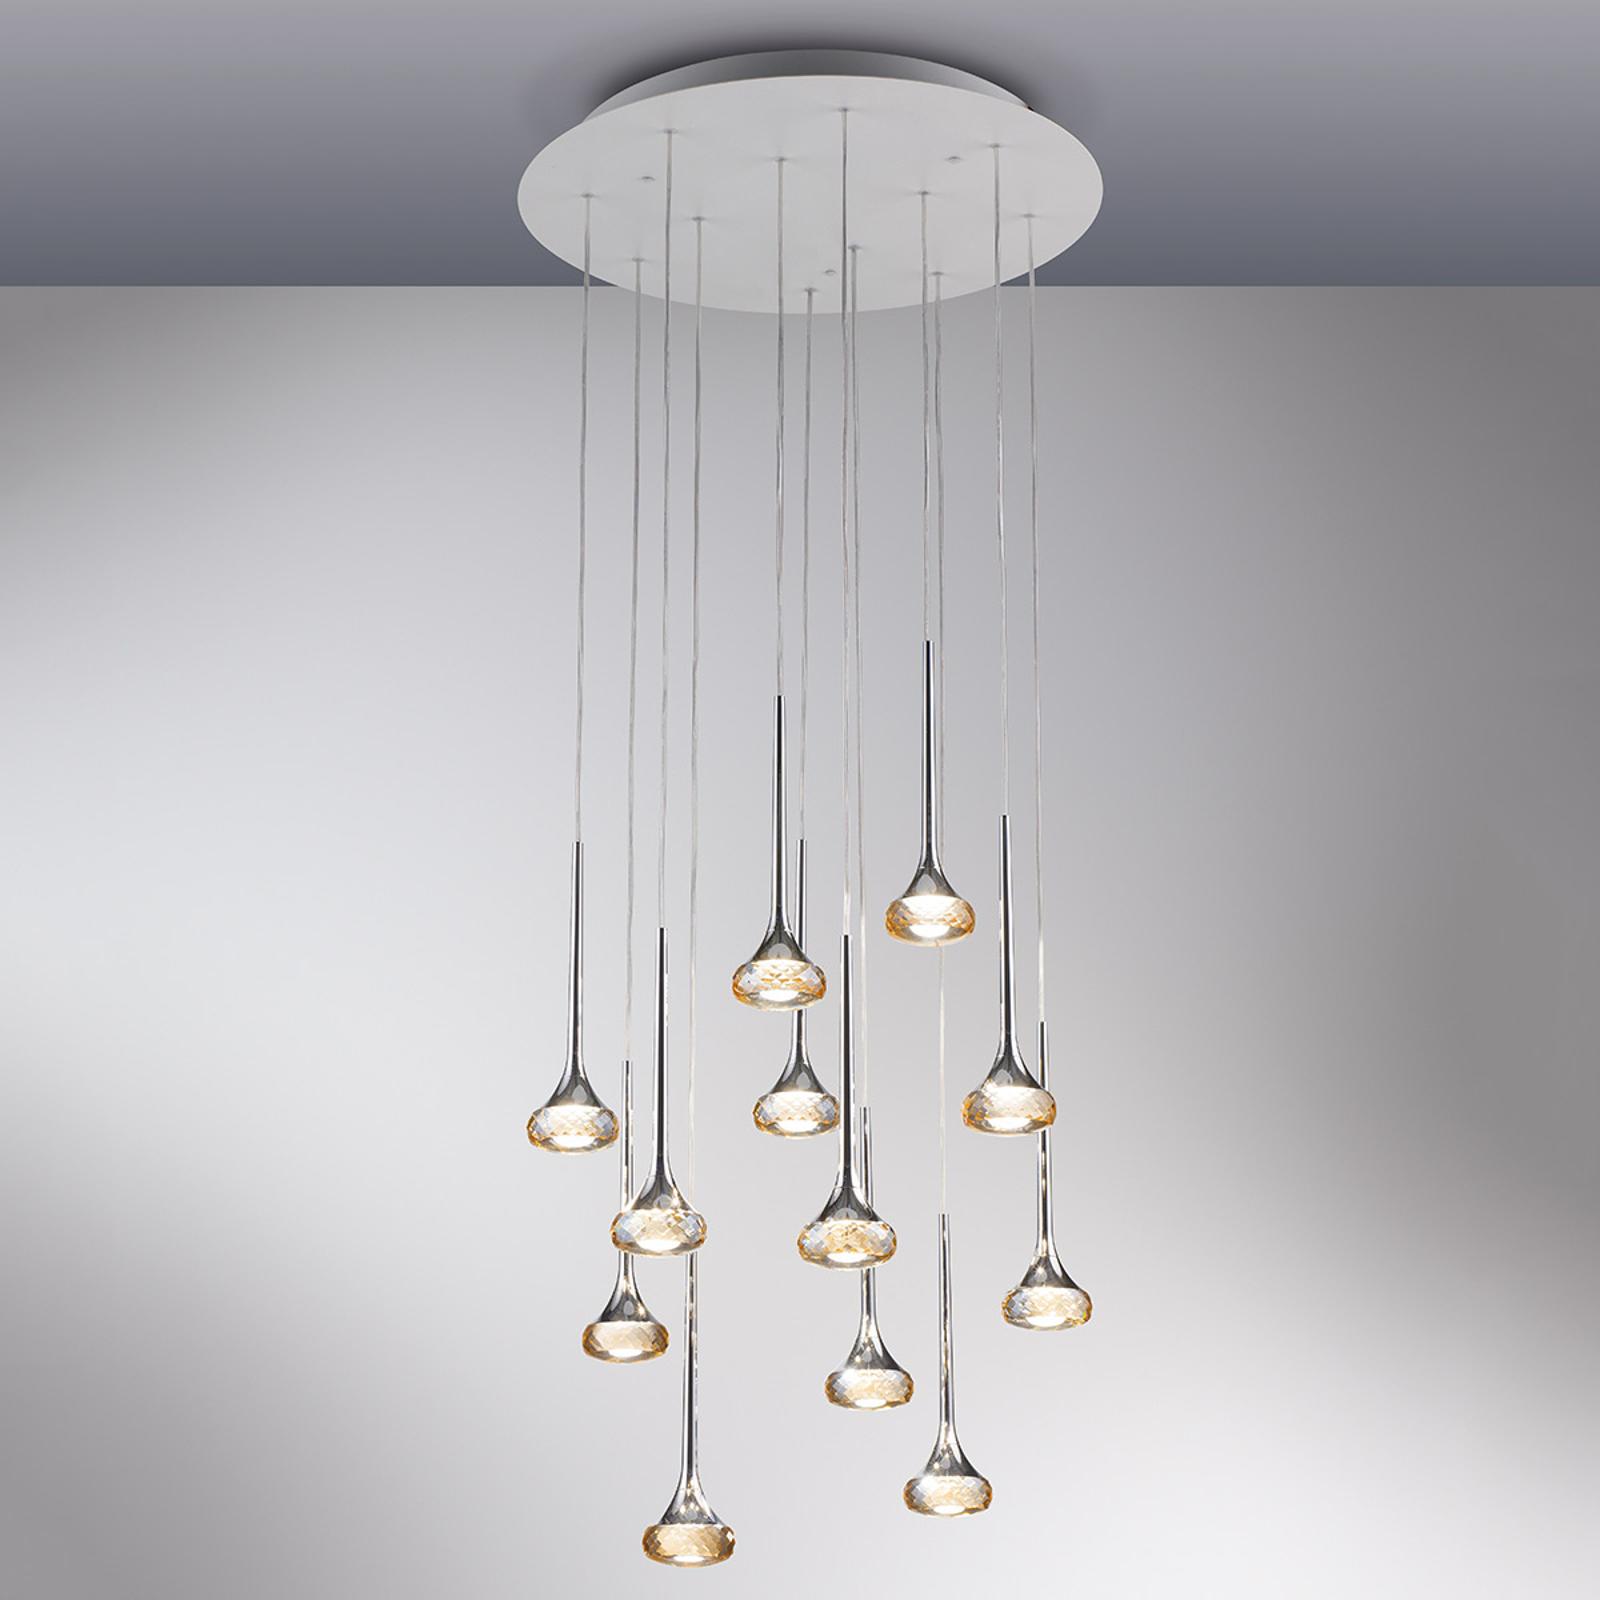 LED hanglamp Fairy met 12 lampjes